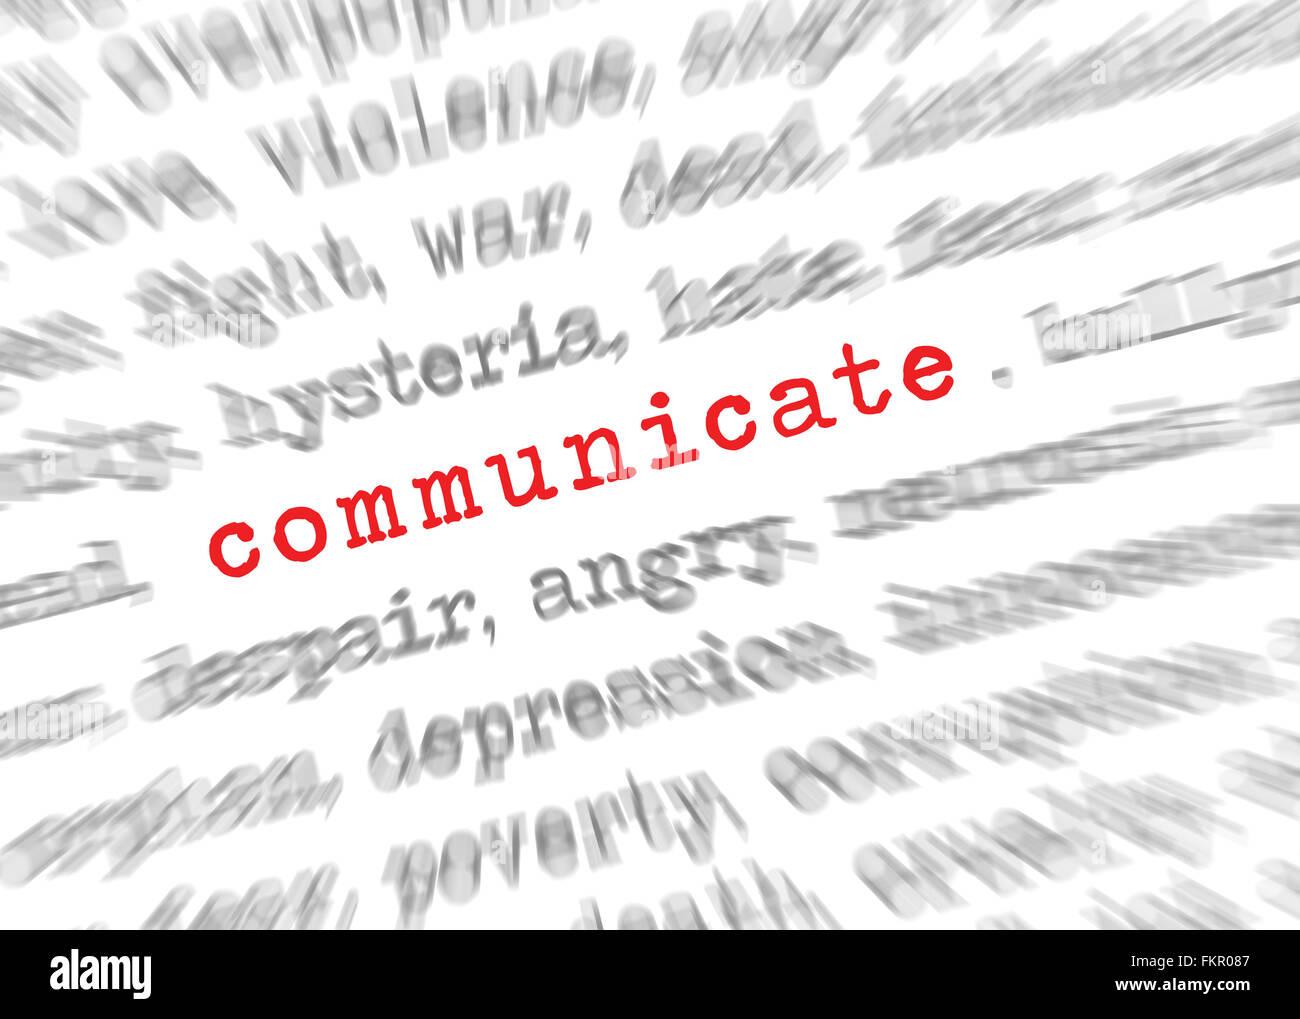 Texto Blured efecto zoom con enfoque en comunicarse Imagen De Stock